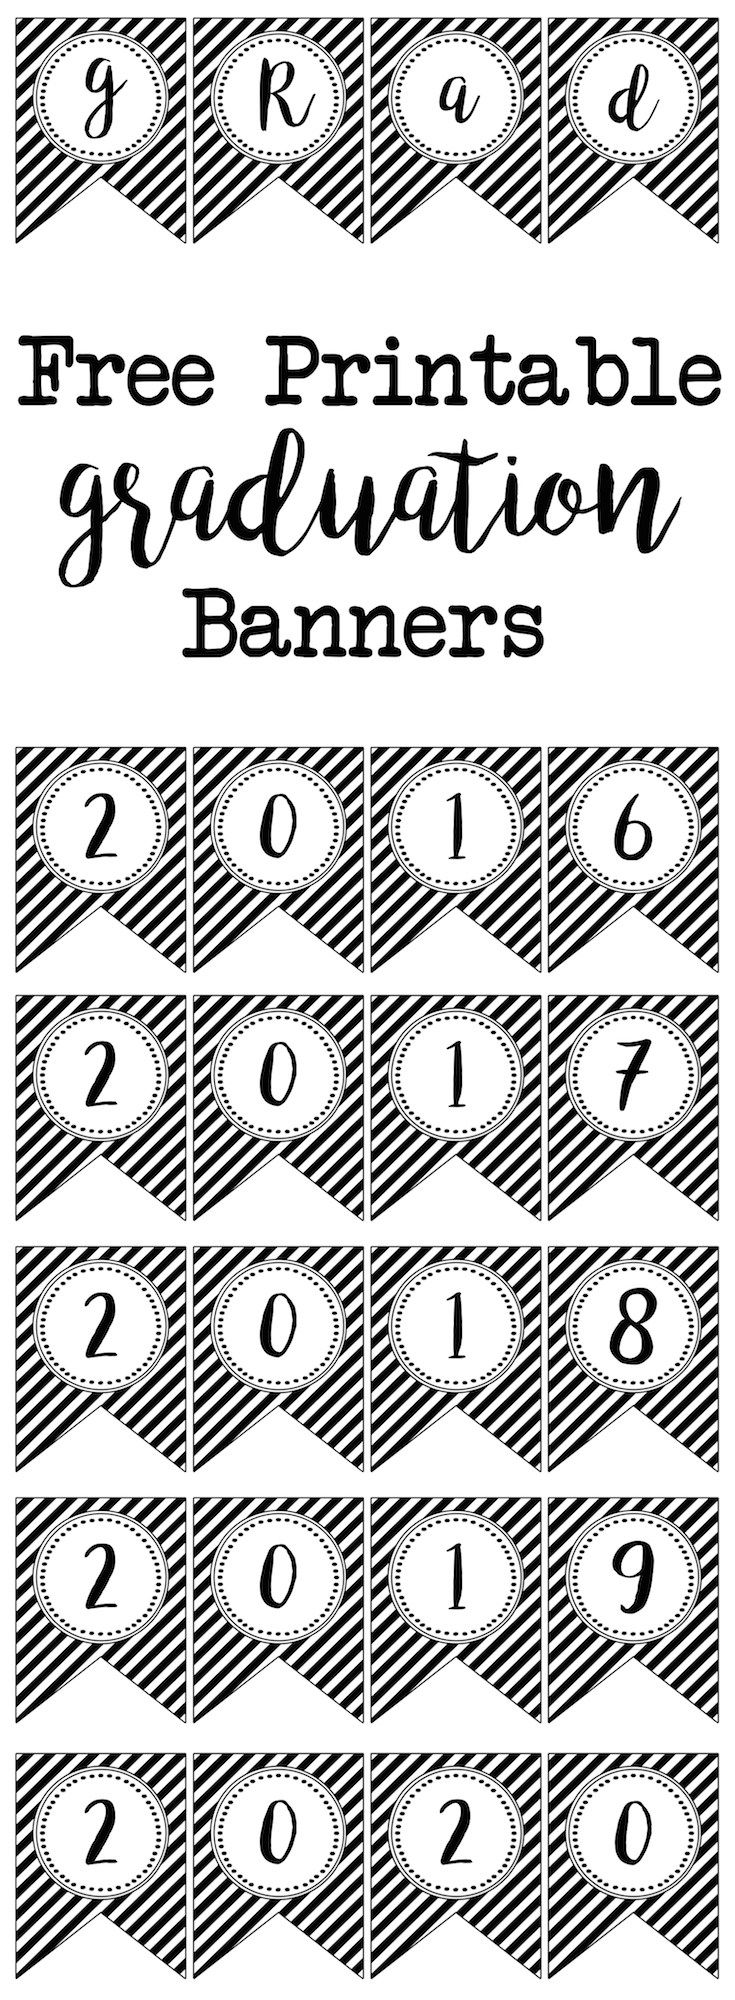 254 best banderines images on Pinterest | Printables, Christmas ...